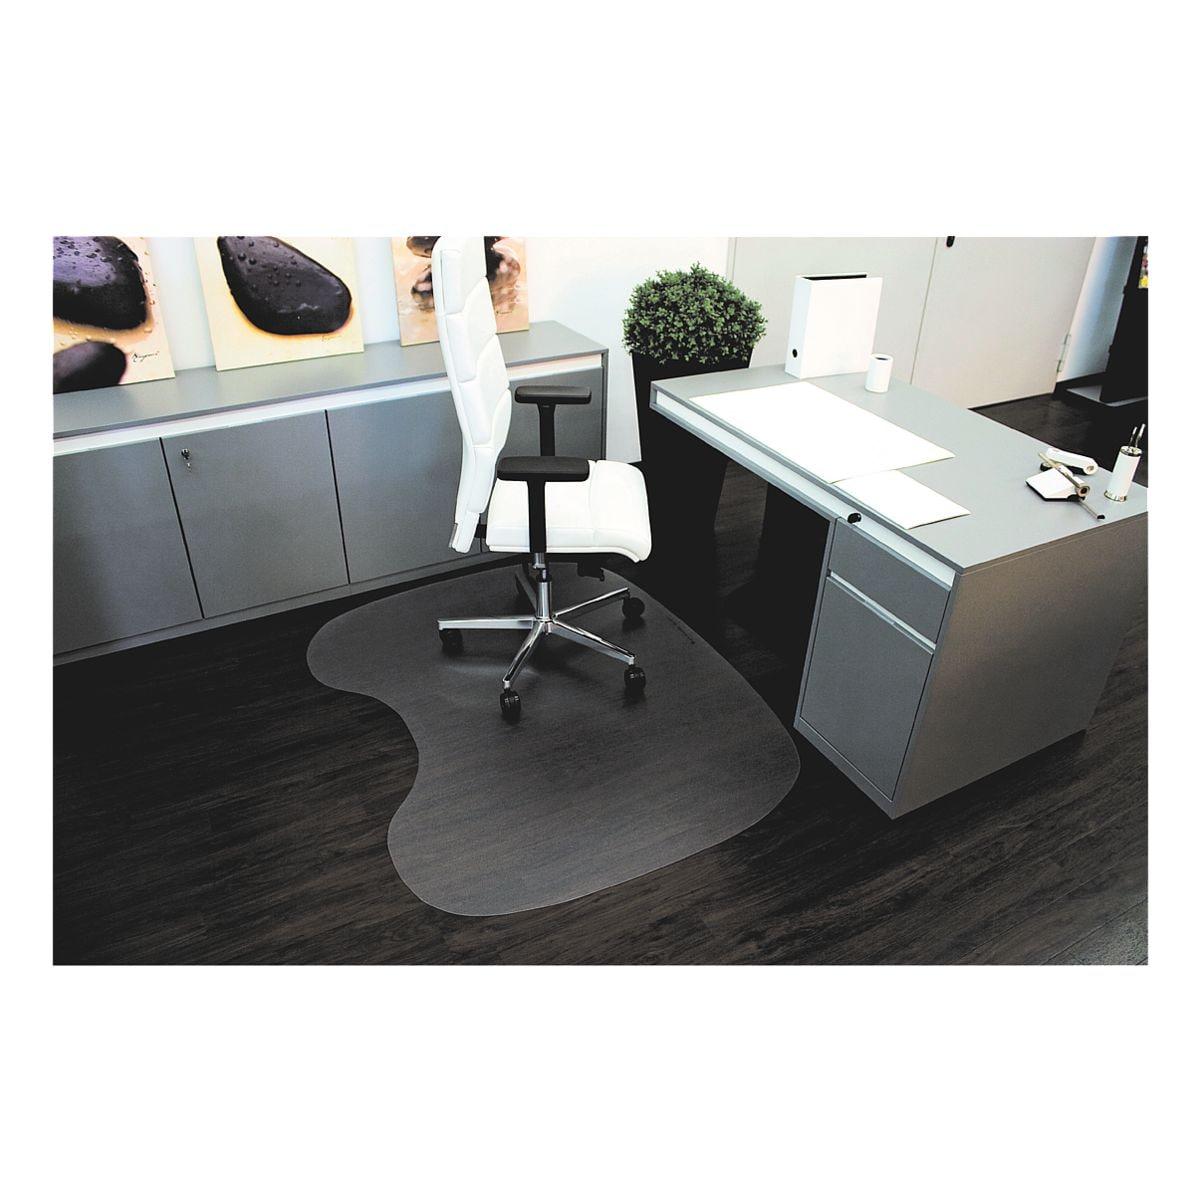 bodenschutzmatte f r hartb den makrolon sonderform n 120 x 150 cm rs office products ecogrip. Black Bedroom Furniture Sets. Home Design Ideas